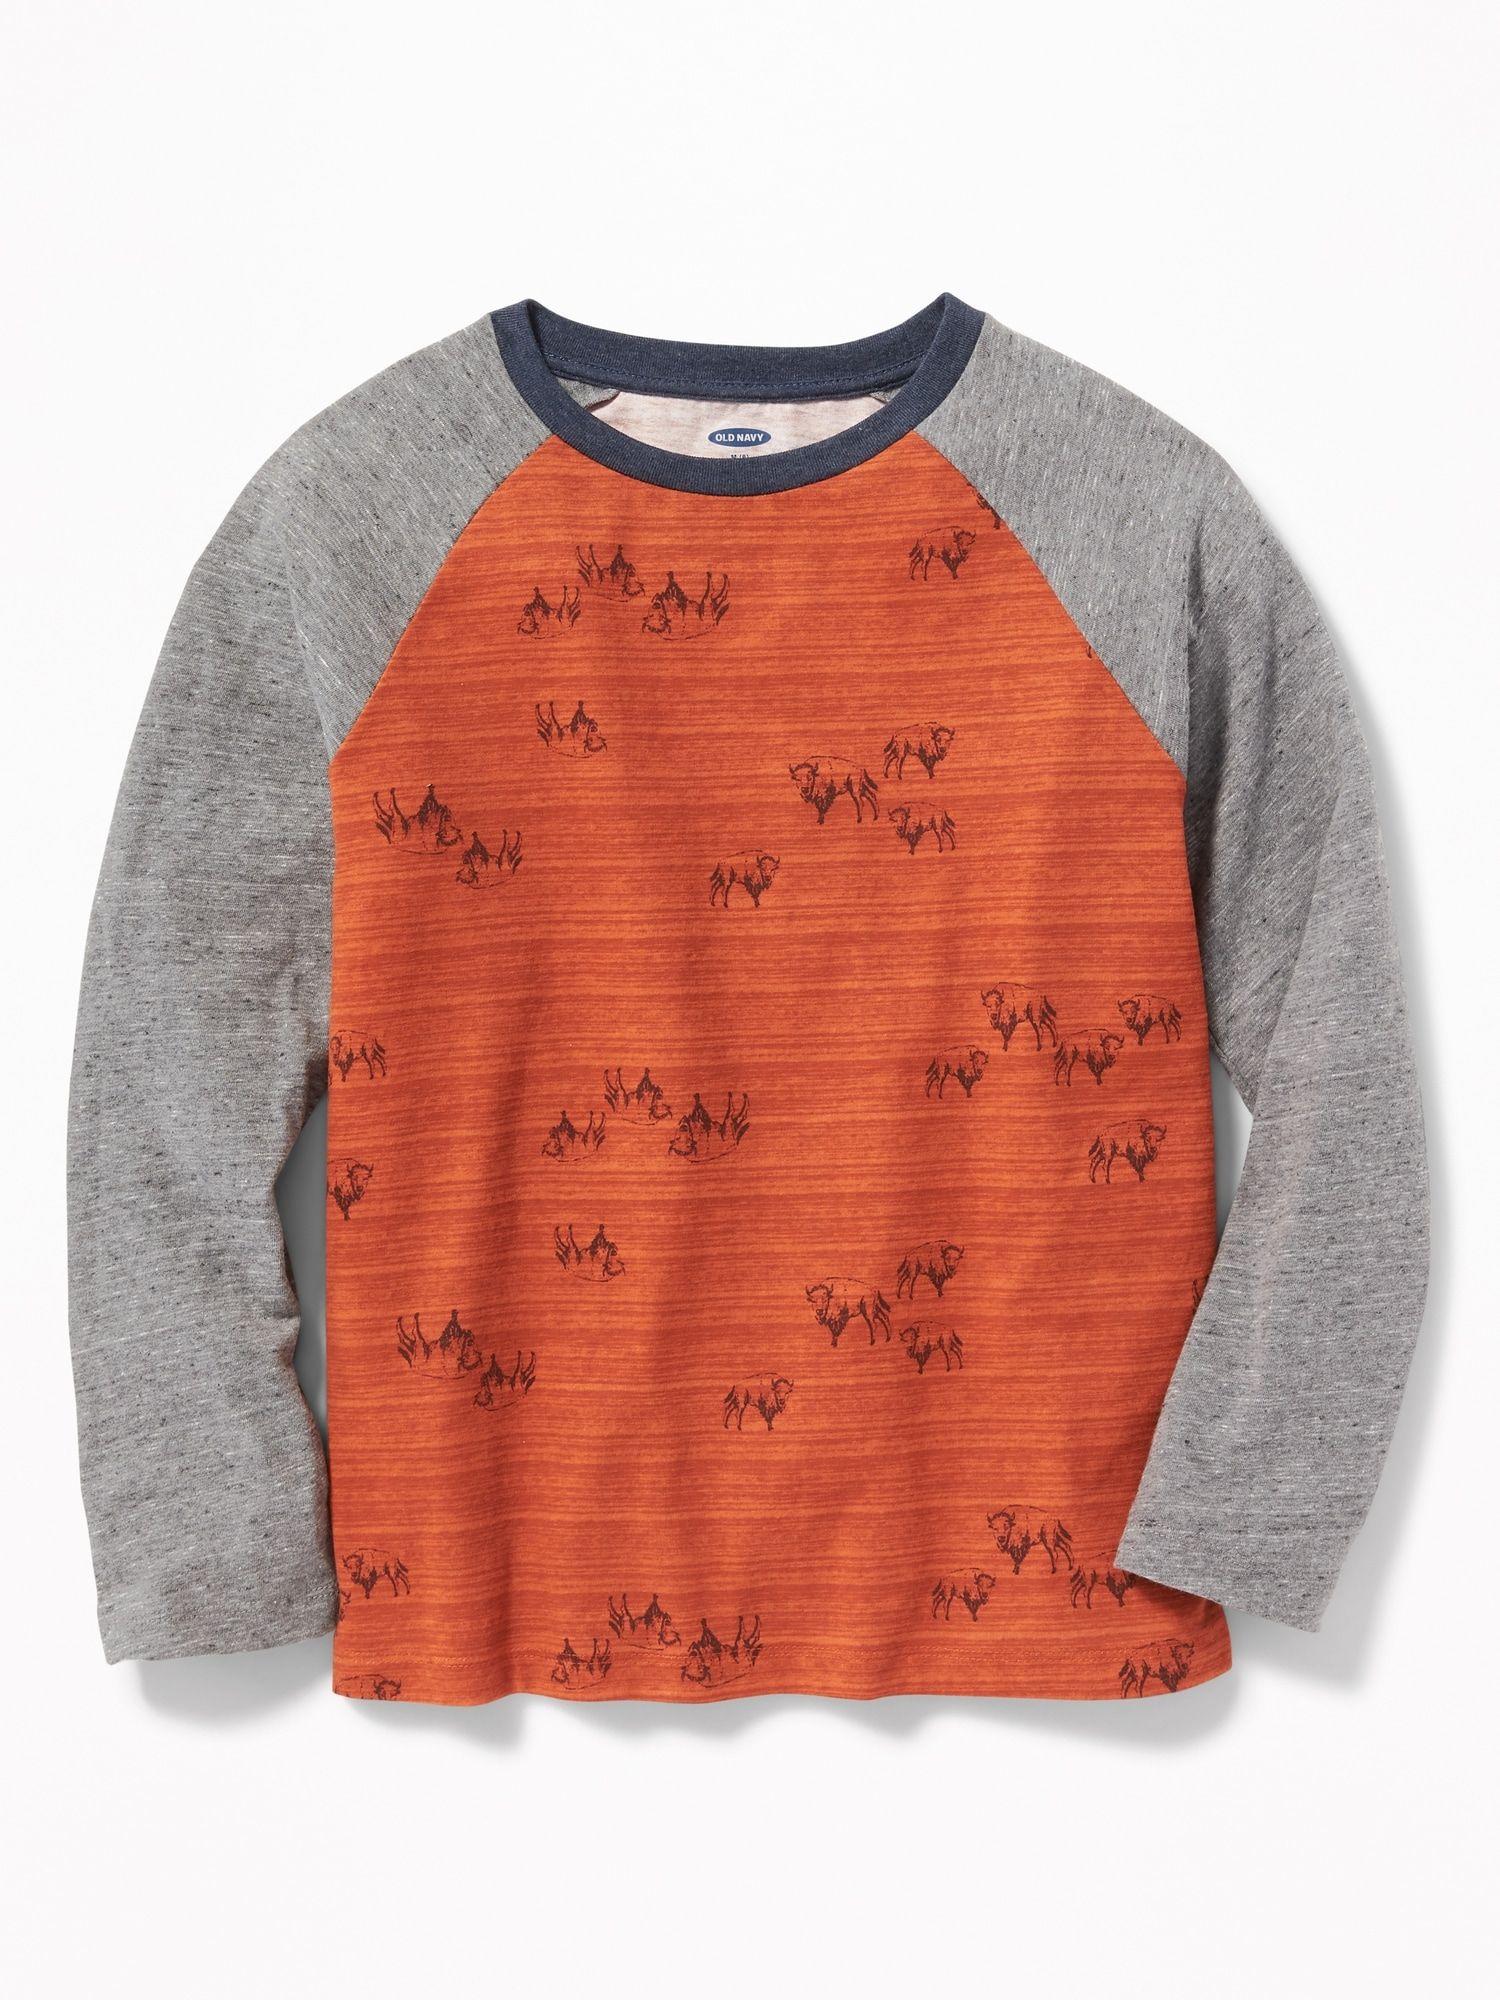 Softest Raglan Sleeve Tee For Boys In 2018 Prints Pinterest